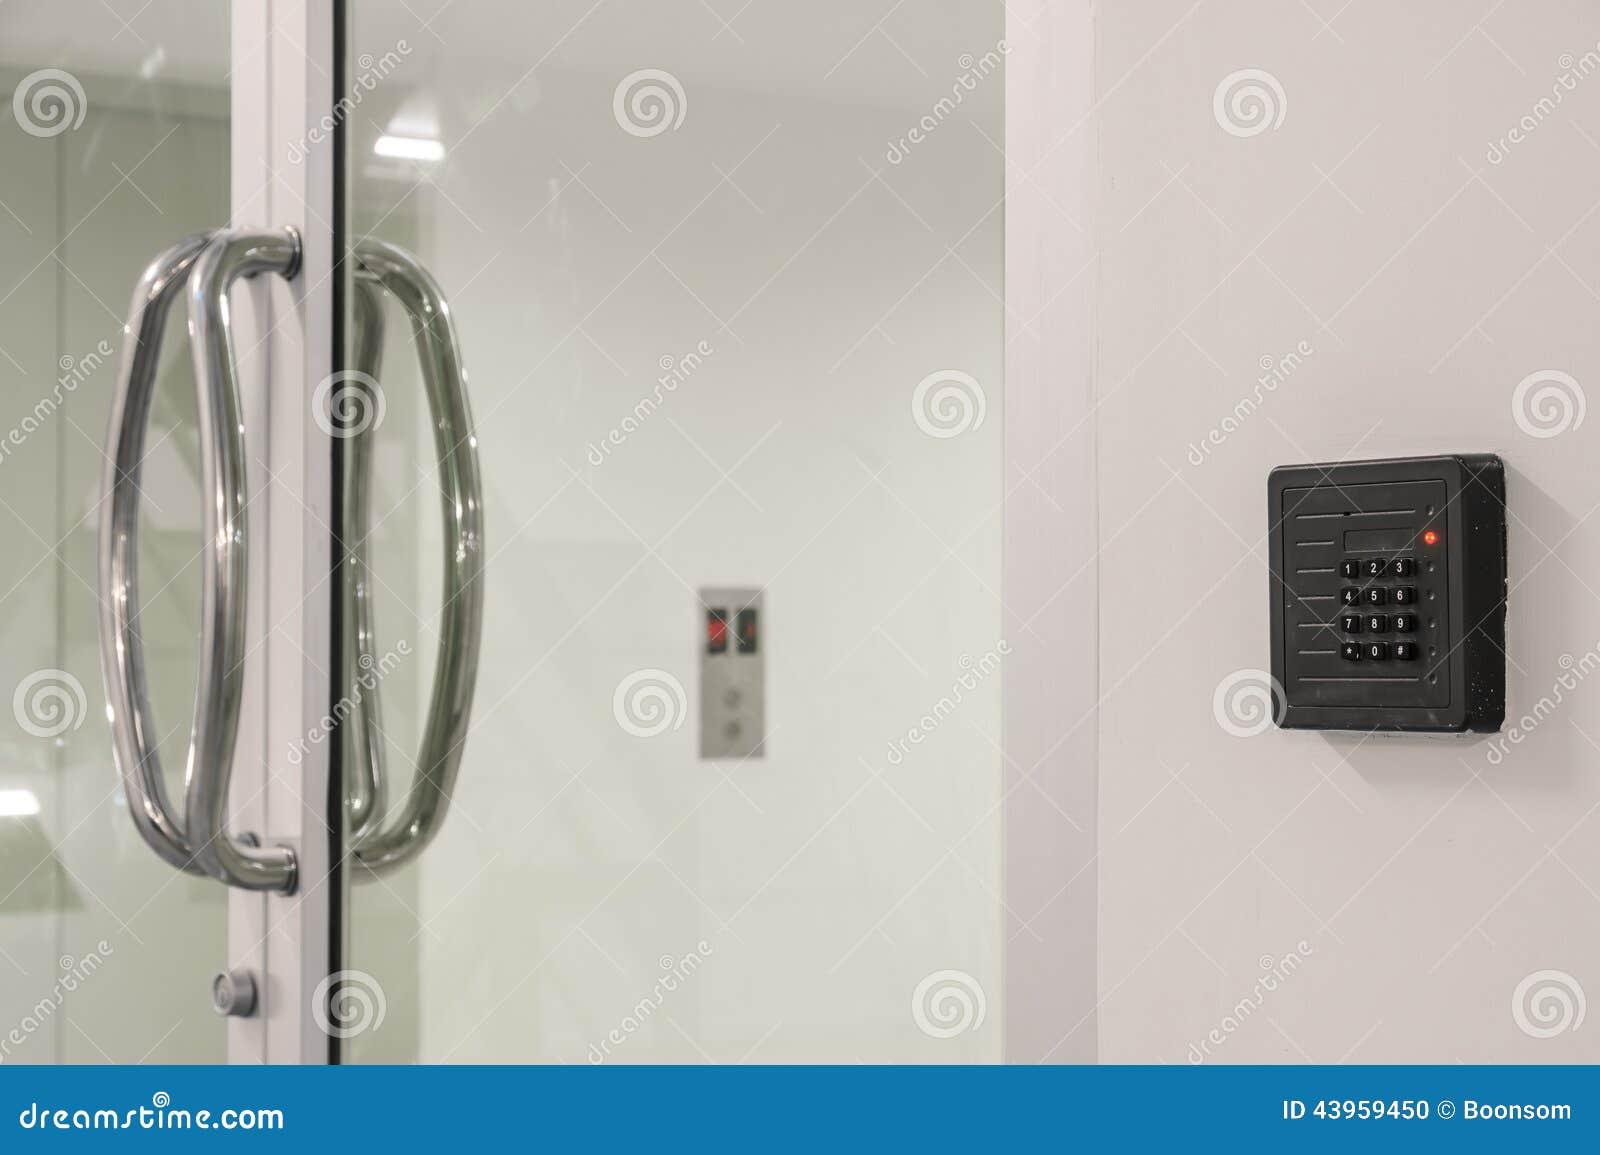 Glass Door With Keypad Stock Photo Image 43959450